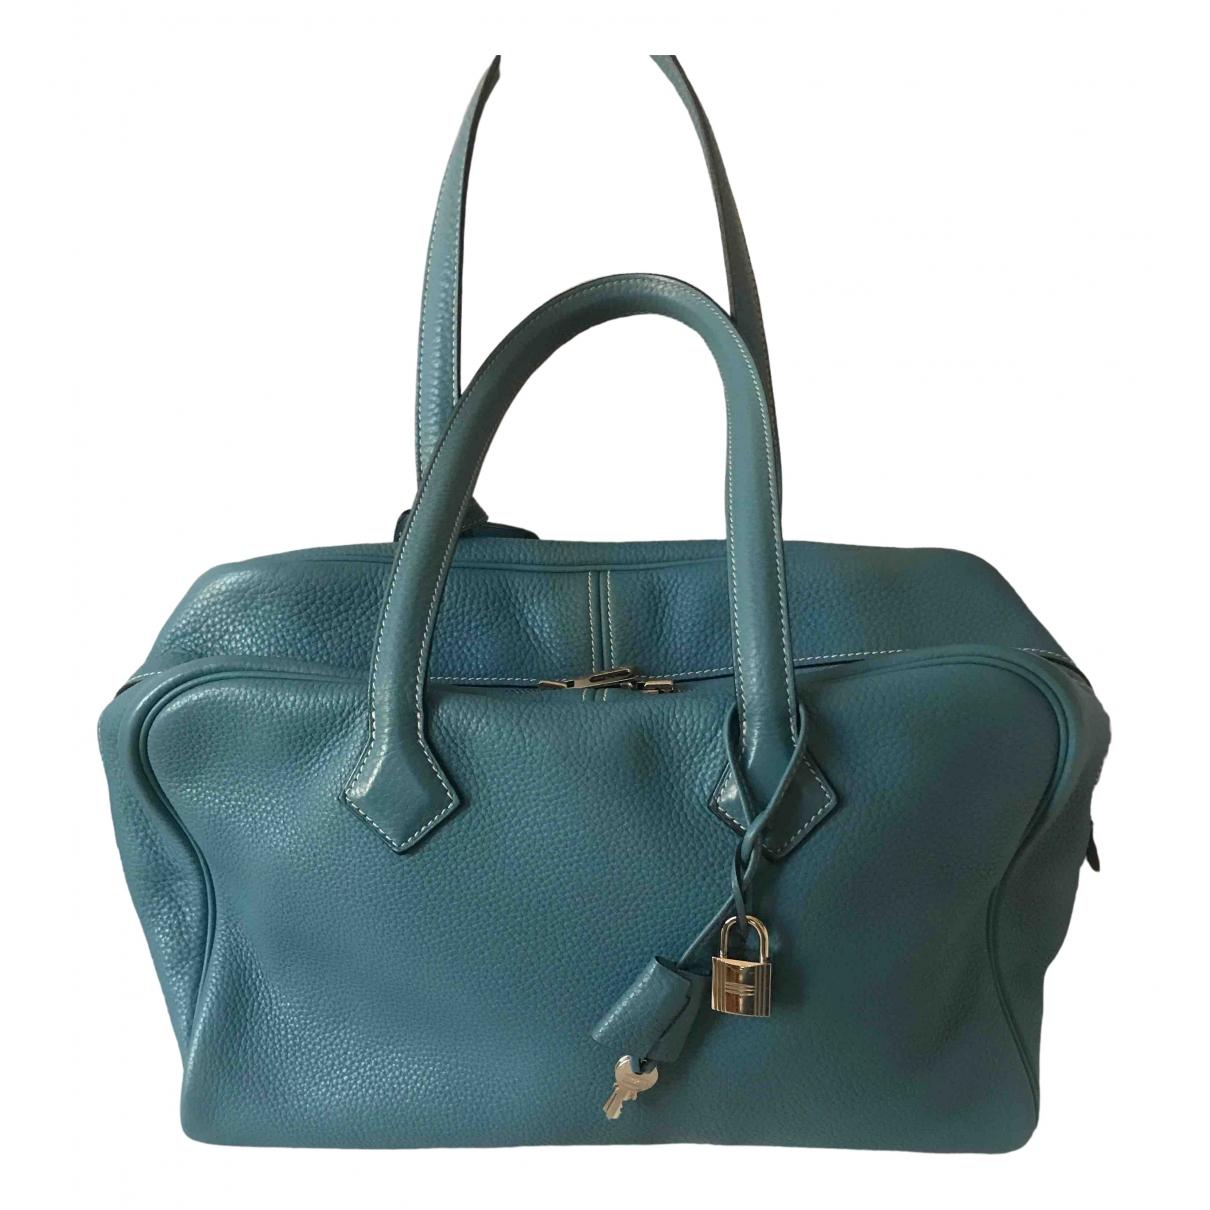 Hermes - Sac a main Victoria pour femme en cuir - bleu